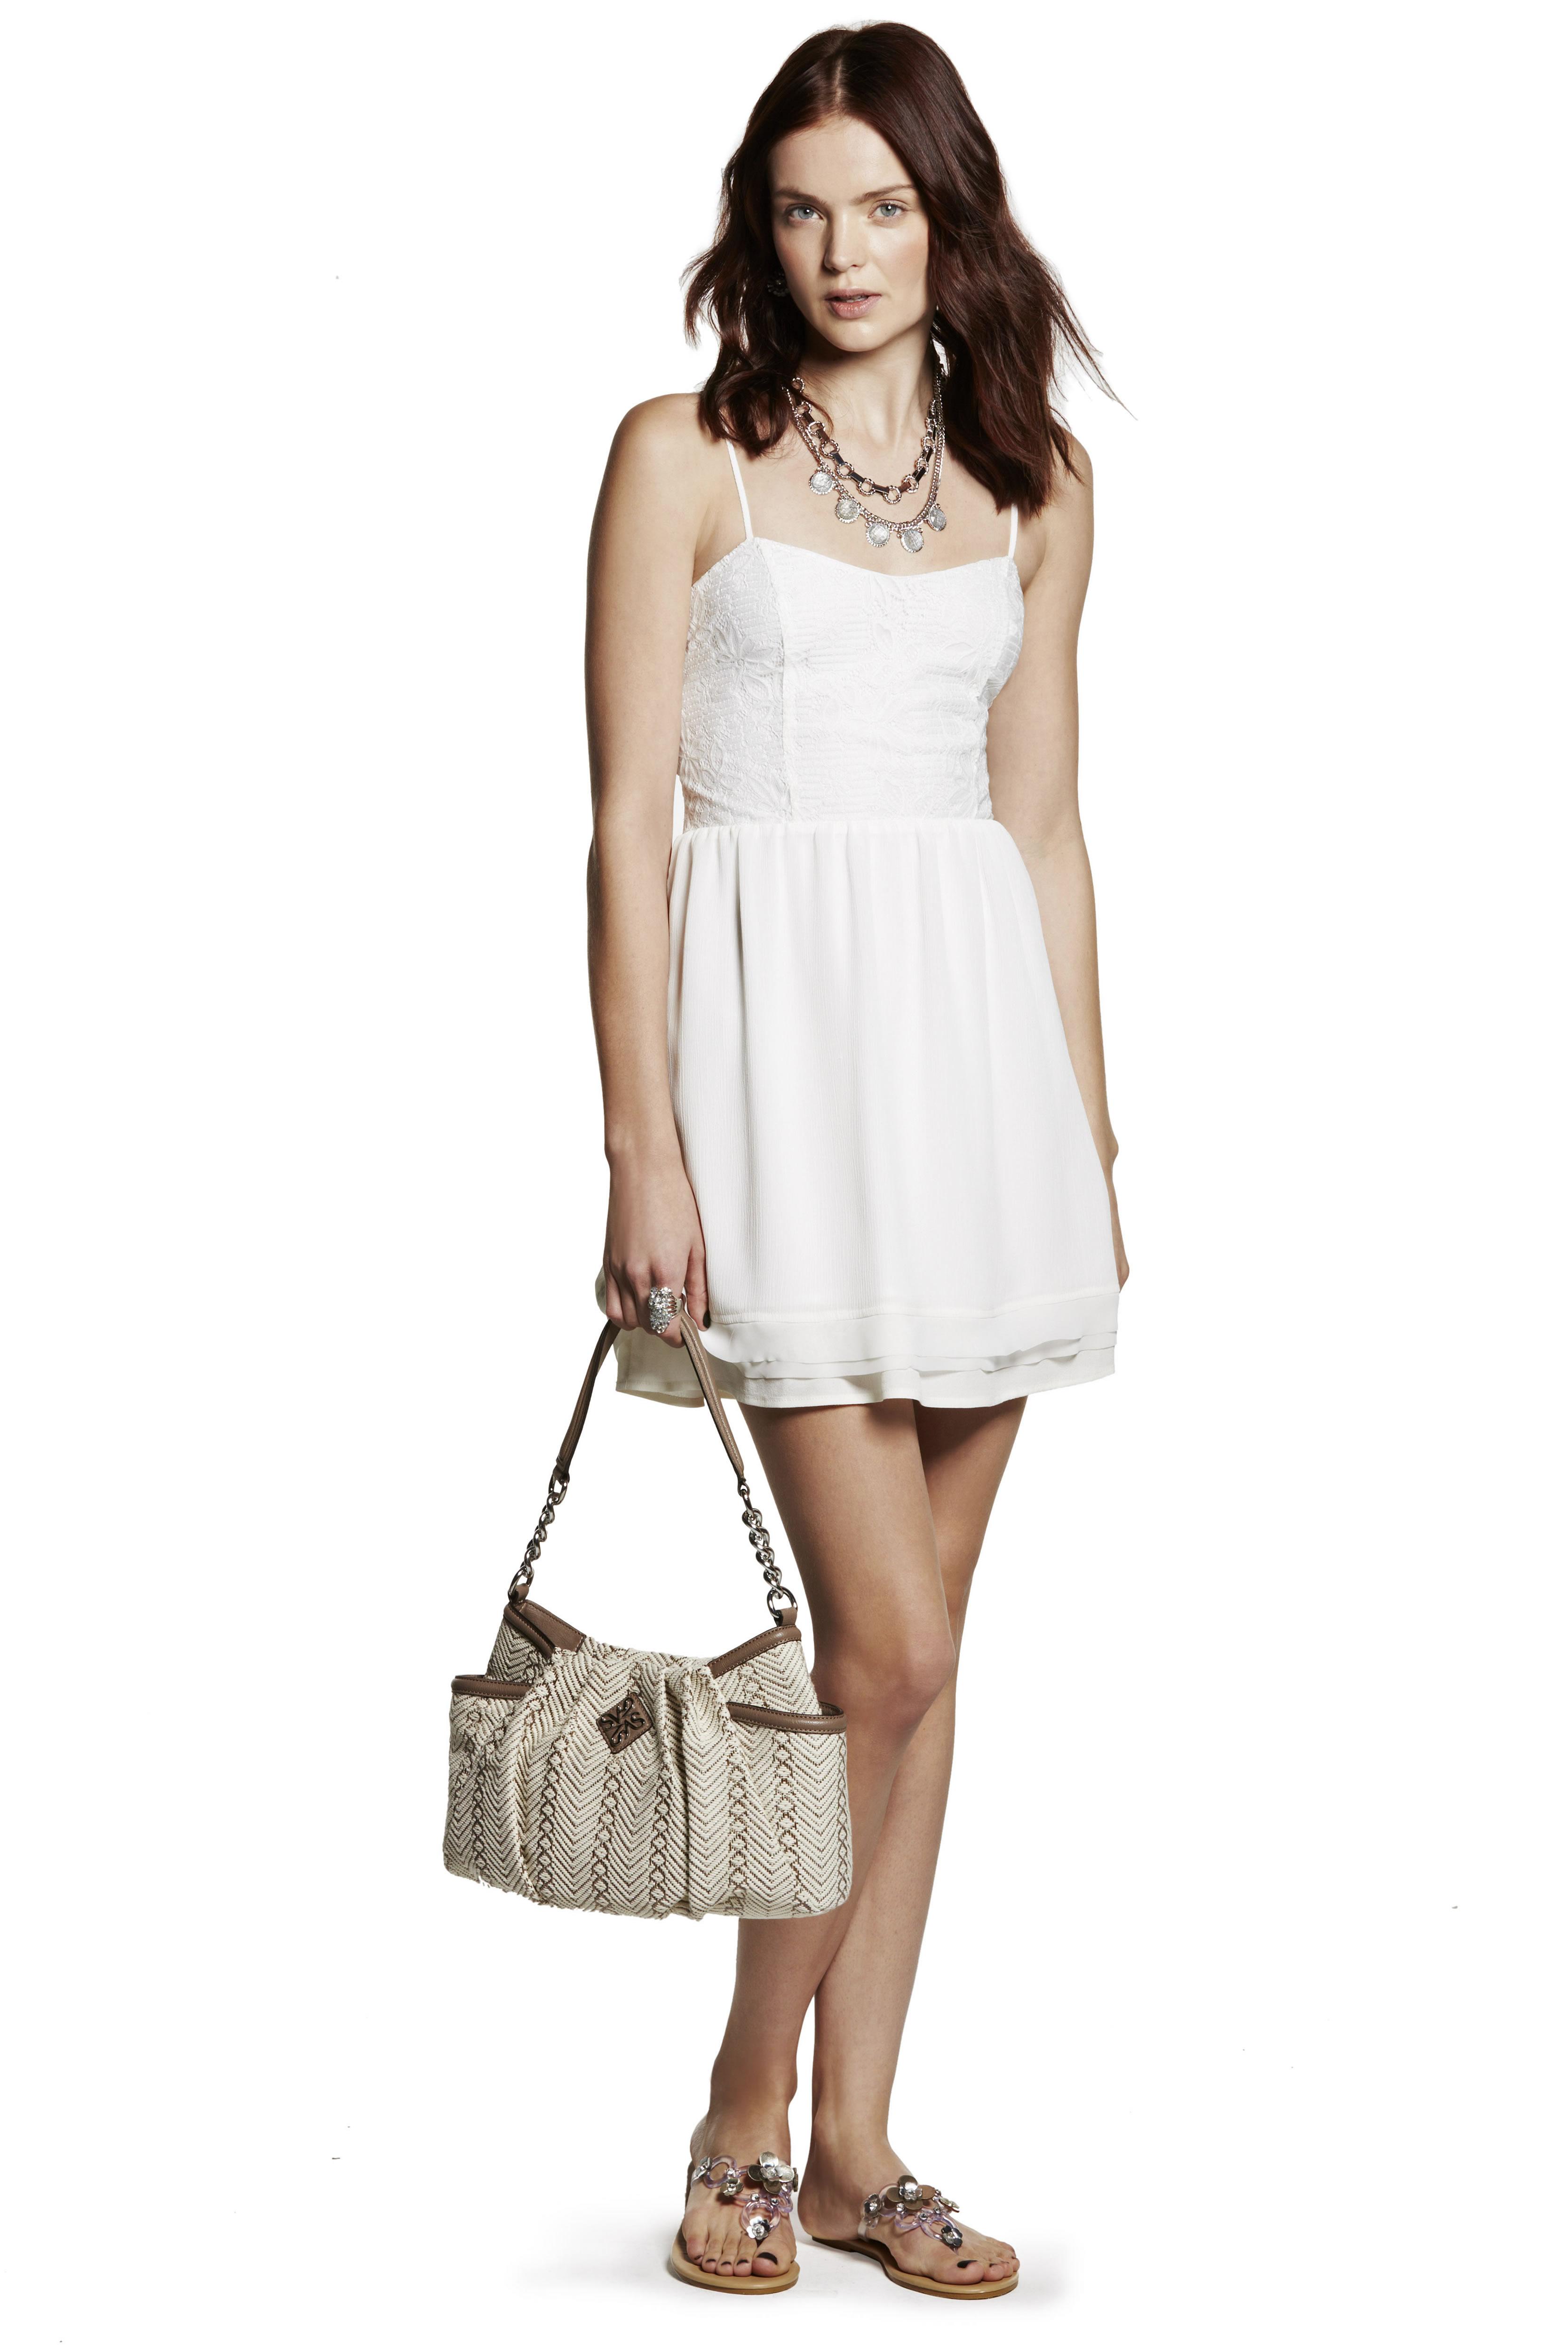 Kohls Semi Formal Dresses For Teens Dress Images